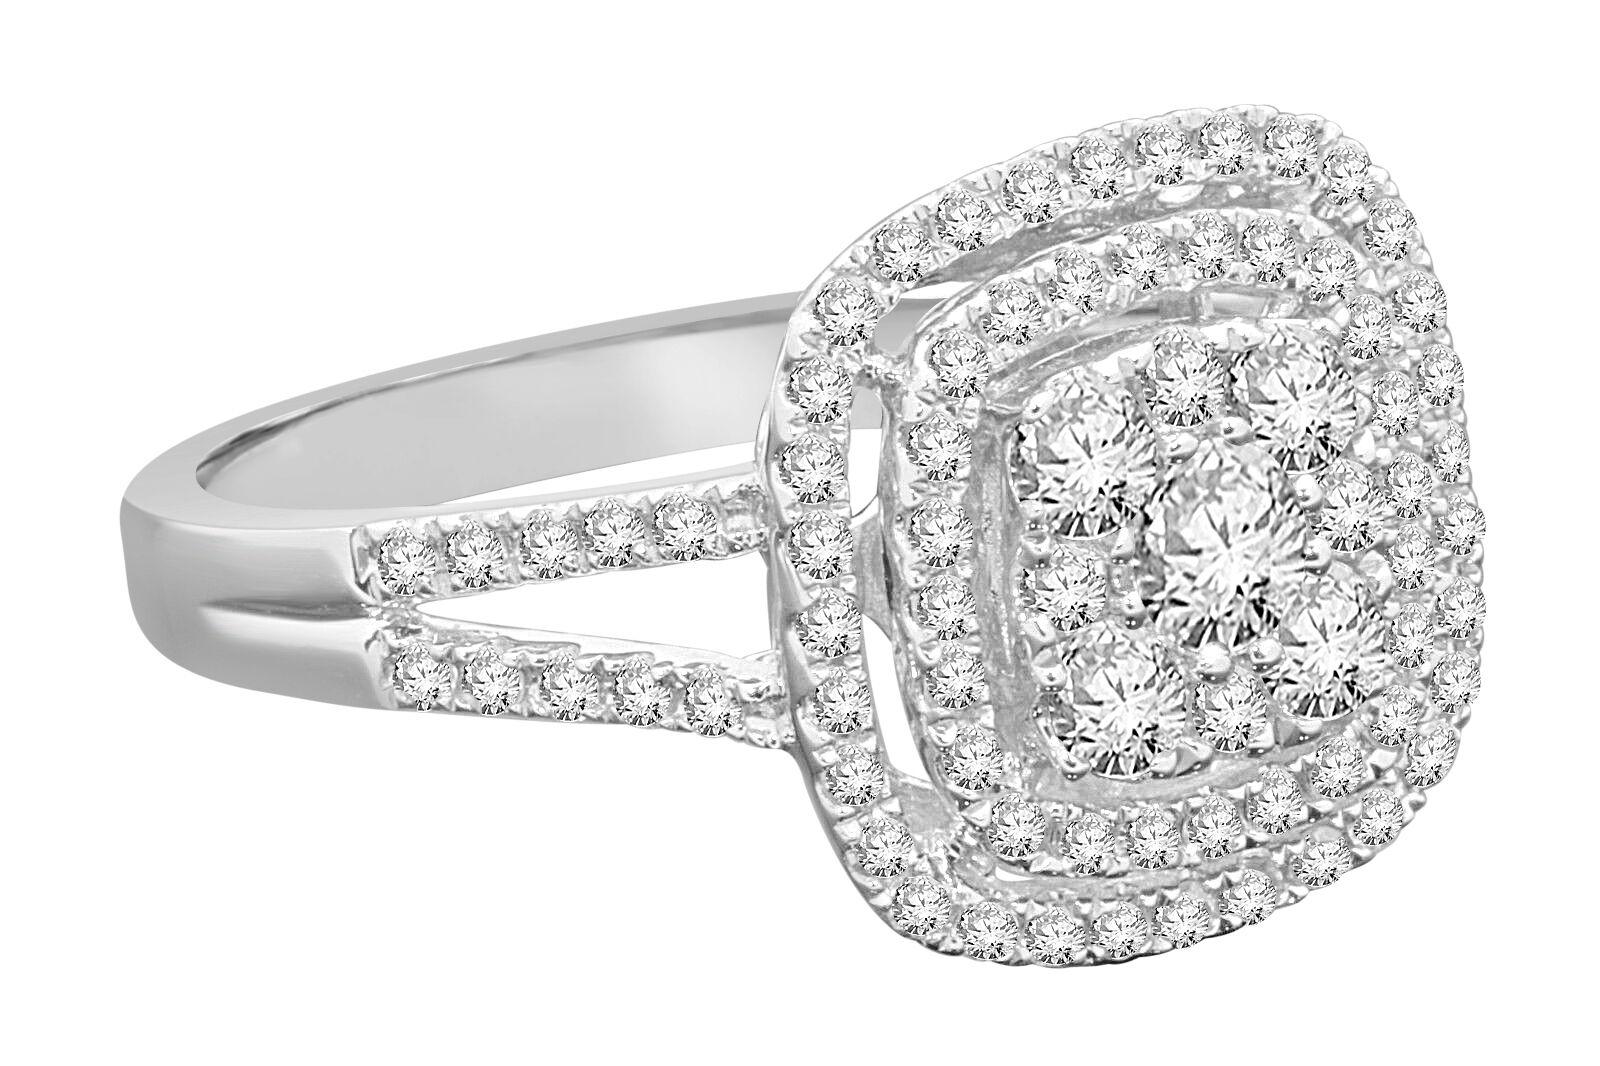 10k White Gold 116 Carat Womens Real Diamond Bridal. Wedding Set Engagement Rings. Little Finger Wedding Rings. Huge Wedding Rings. 4ct Wedding Rings. Contemporary Men's Wedding Rings. Stackable Engagement Rings. Seashells Wedding Rings. Guide Wedding Rings